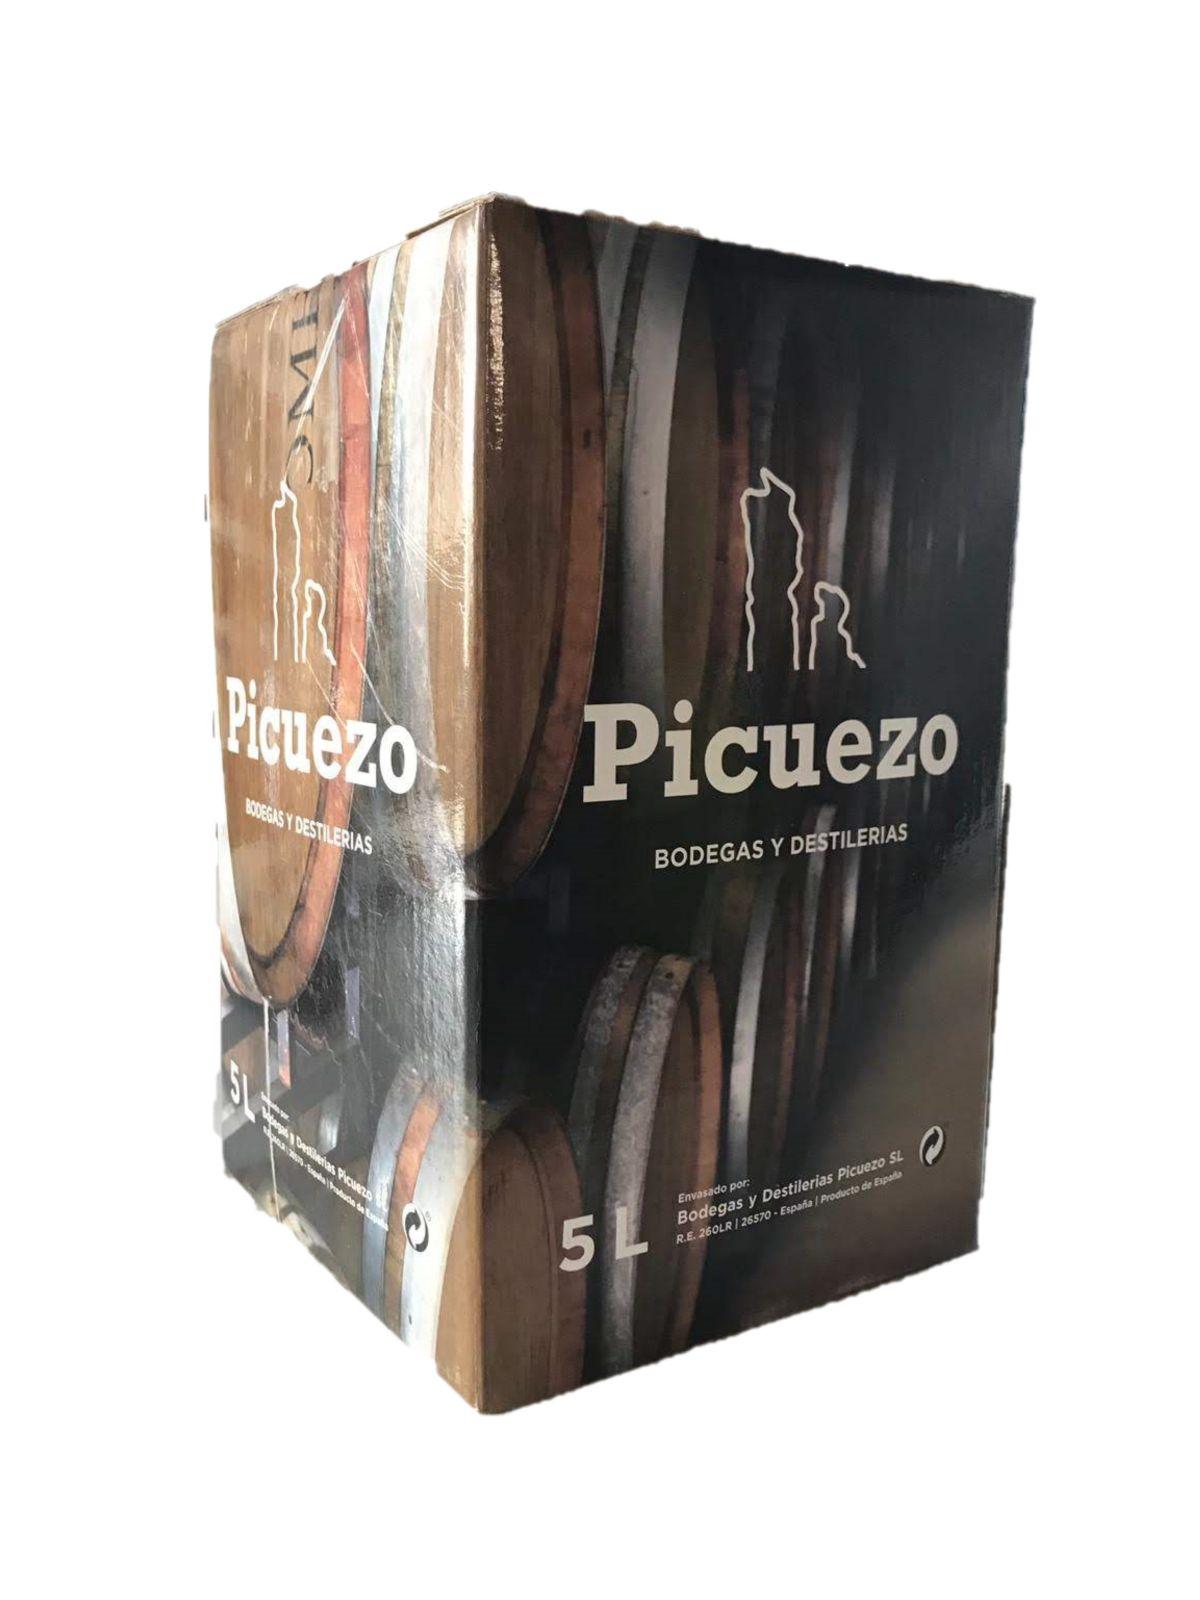 Vino CRIANZA JÓVEN. Bodegas y Destilerias Picuezo, S.L. Bag in box 5L